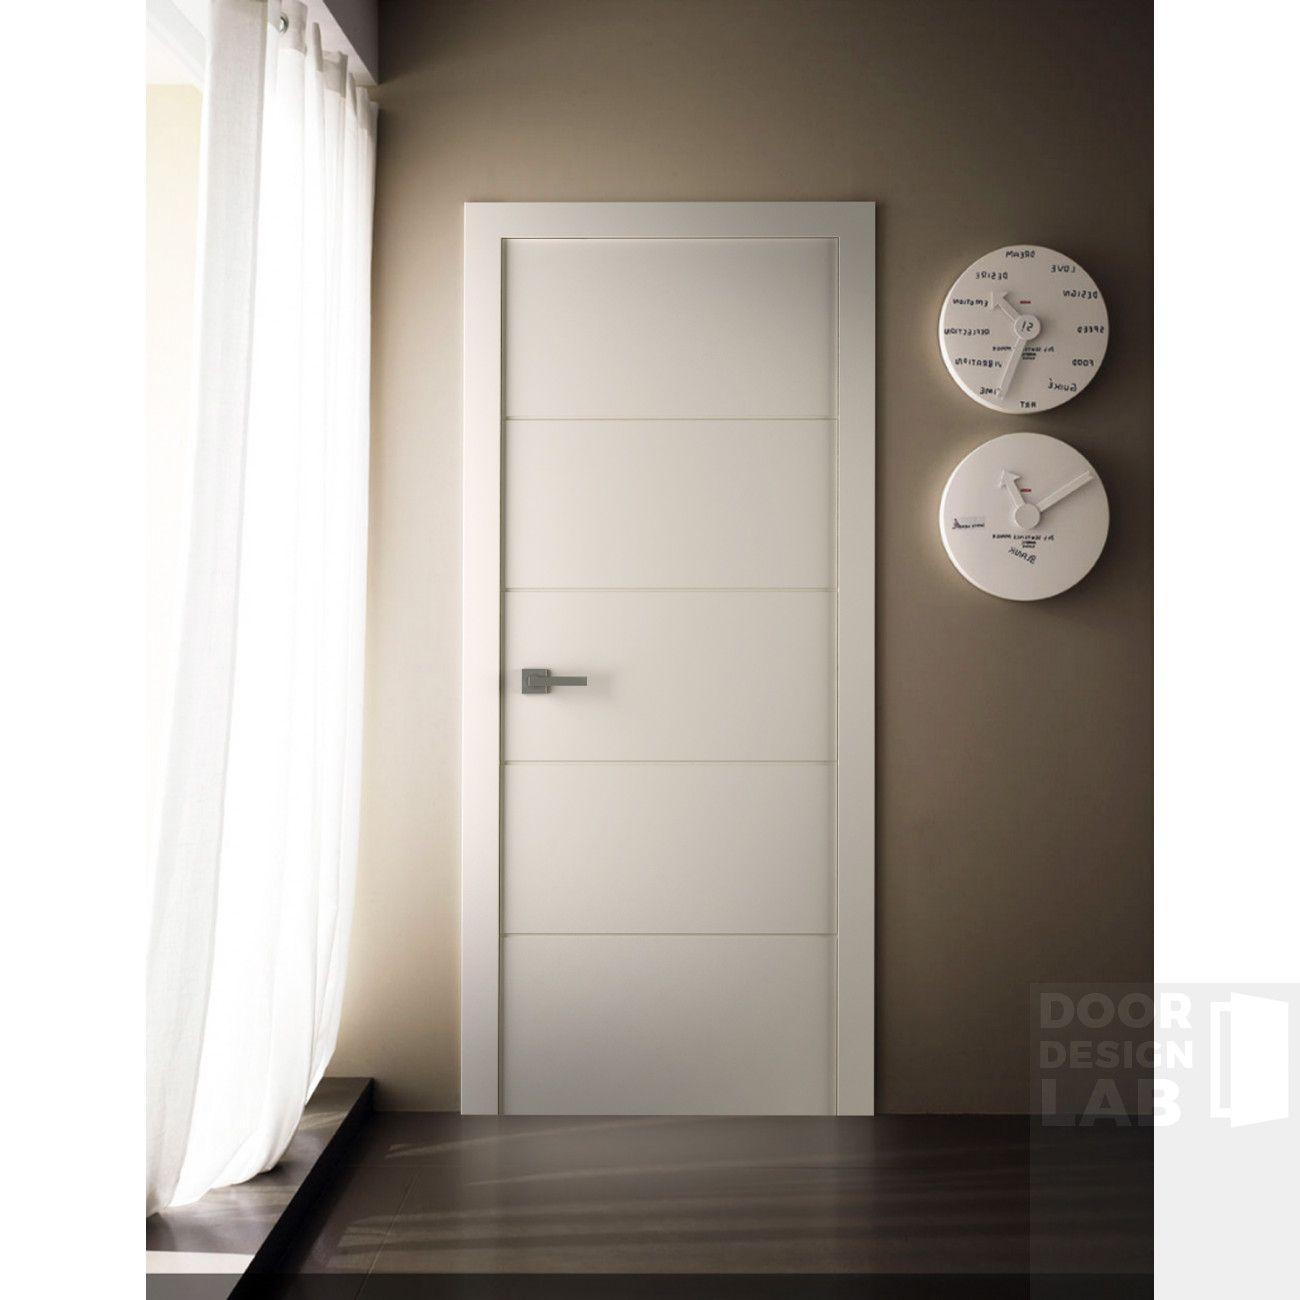 Arvika Polar White Modern Interior Door Scandinavian Style Flat Solid Core Painted White Sound Proof 4 Horizontal Grooves Belldinni Doors Interior Modern Doors Interior Interior Door Styles